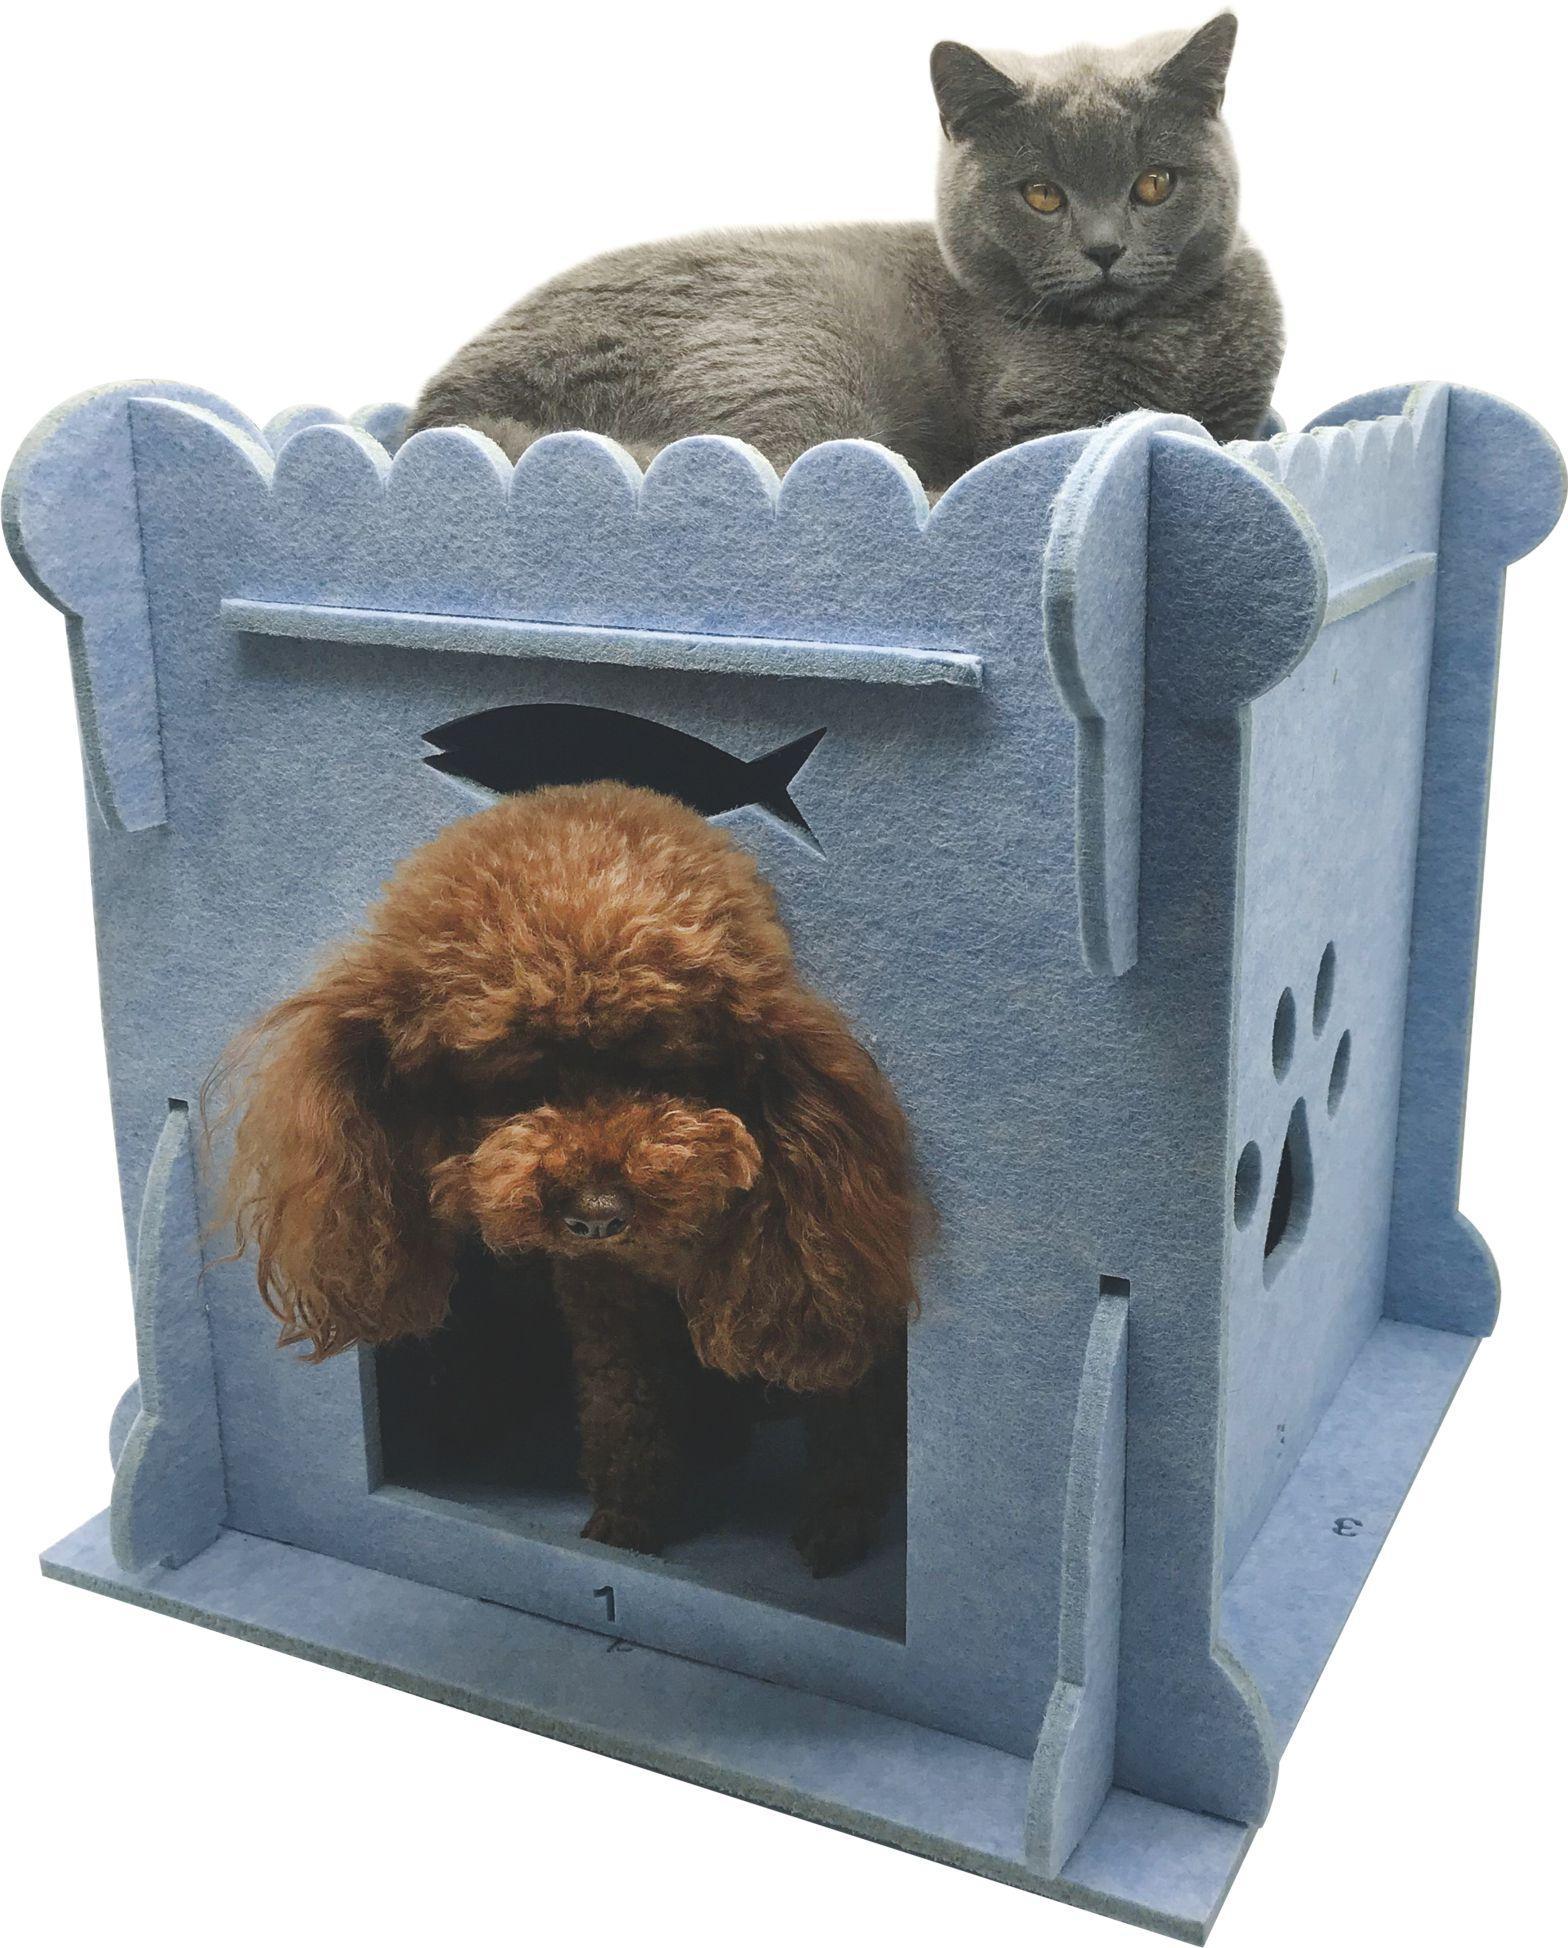 New Arrival Luxury Felt Cat House Double Tower Shape 4